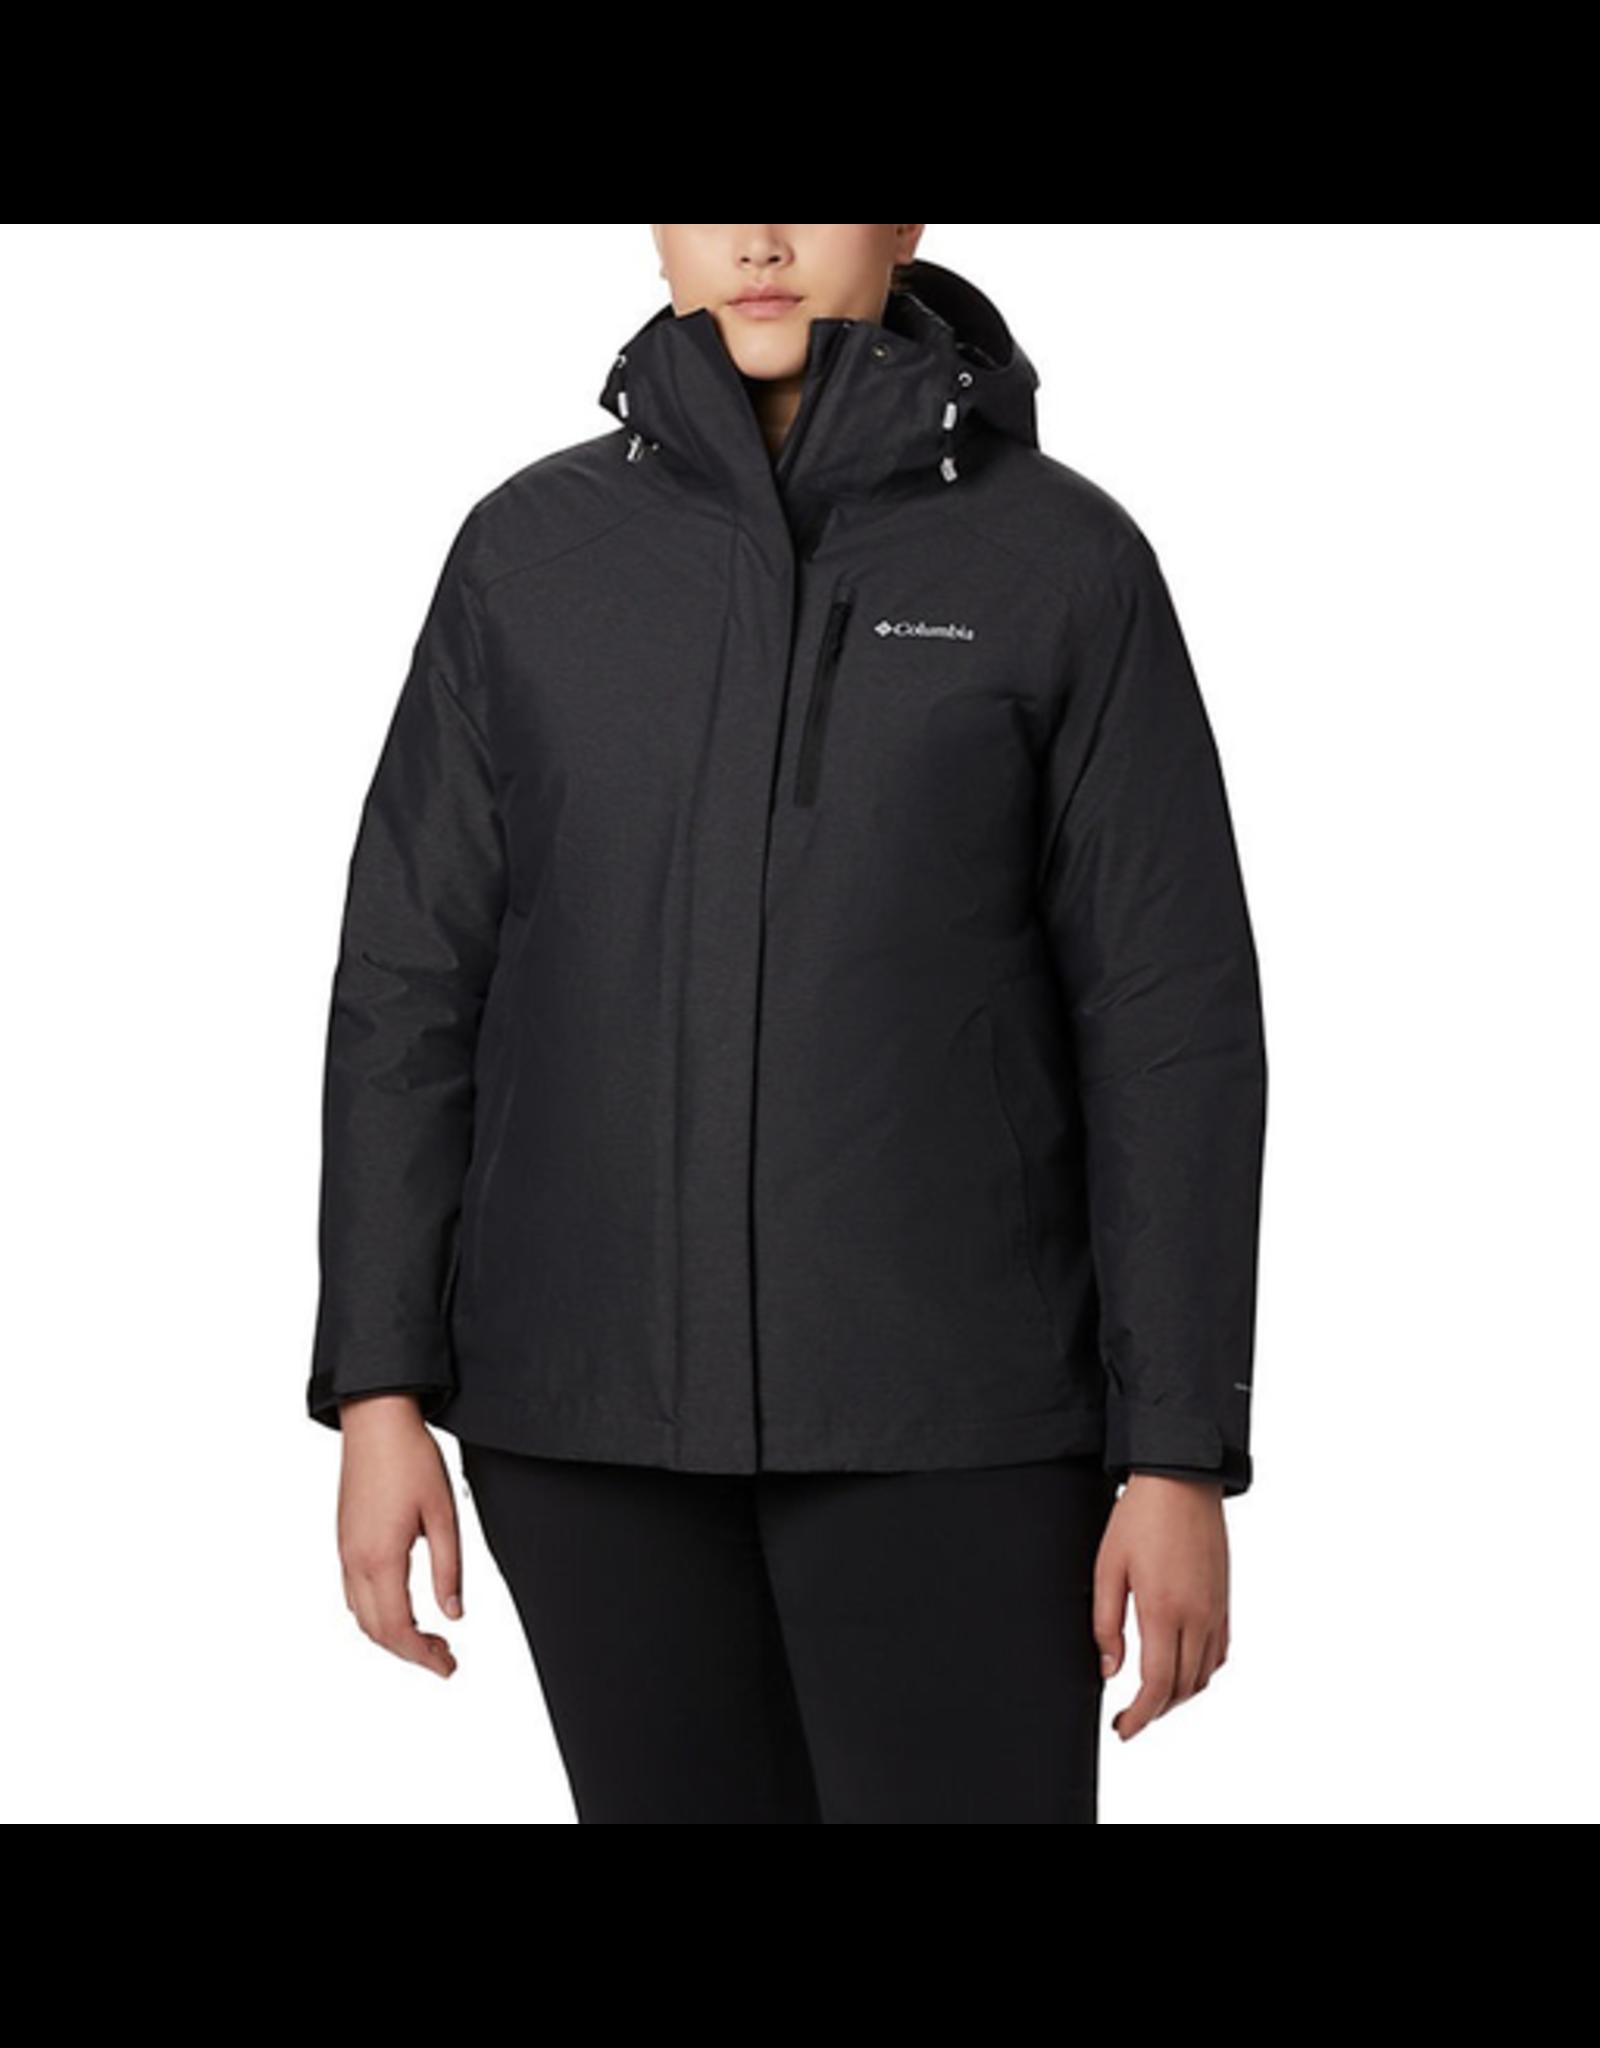 Columbia Columbia Women's Whirlibird IV Interchange Jacket - Plus Size